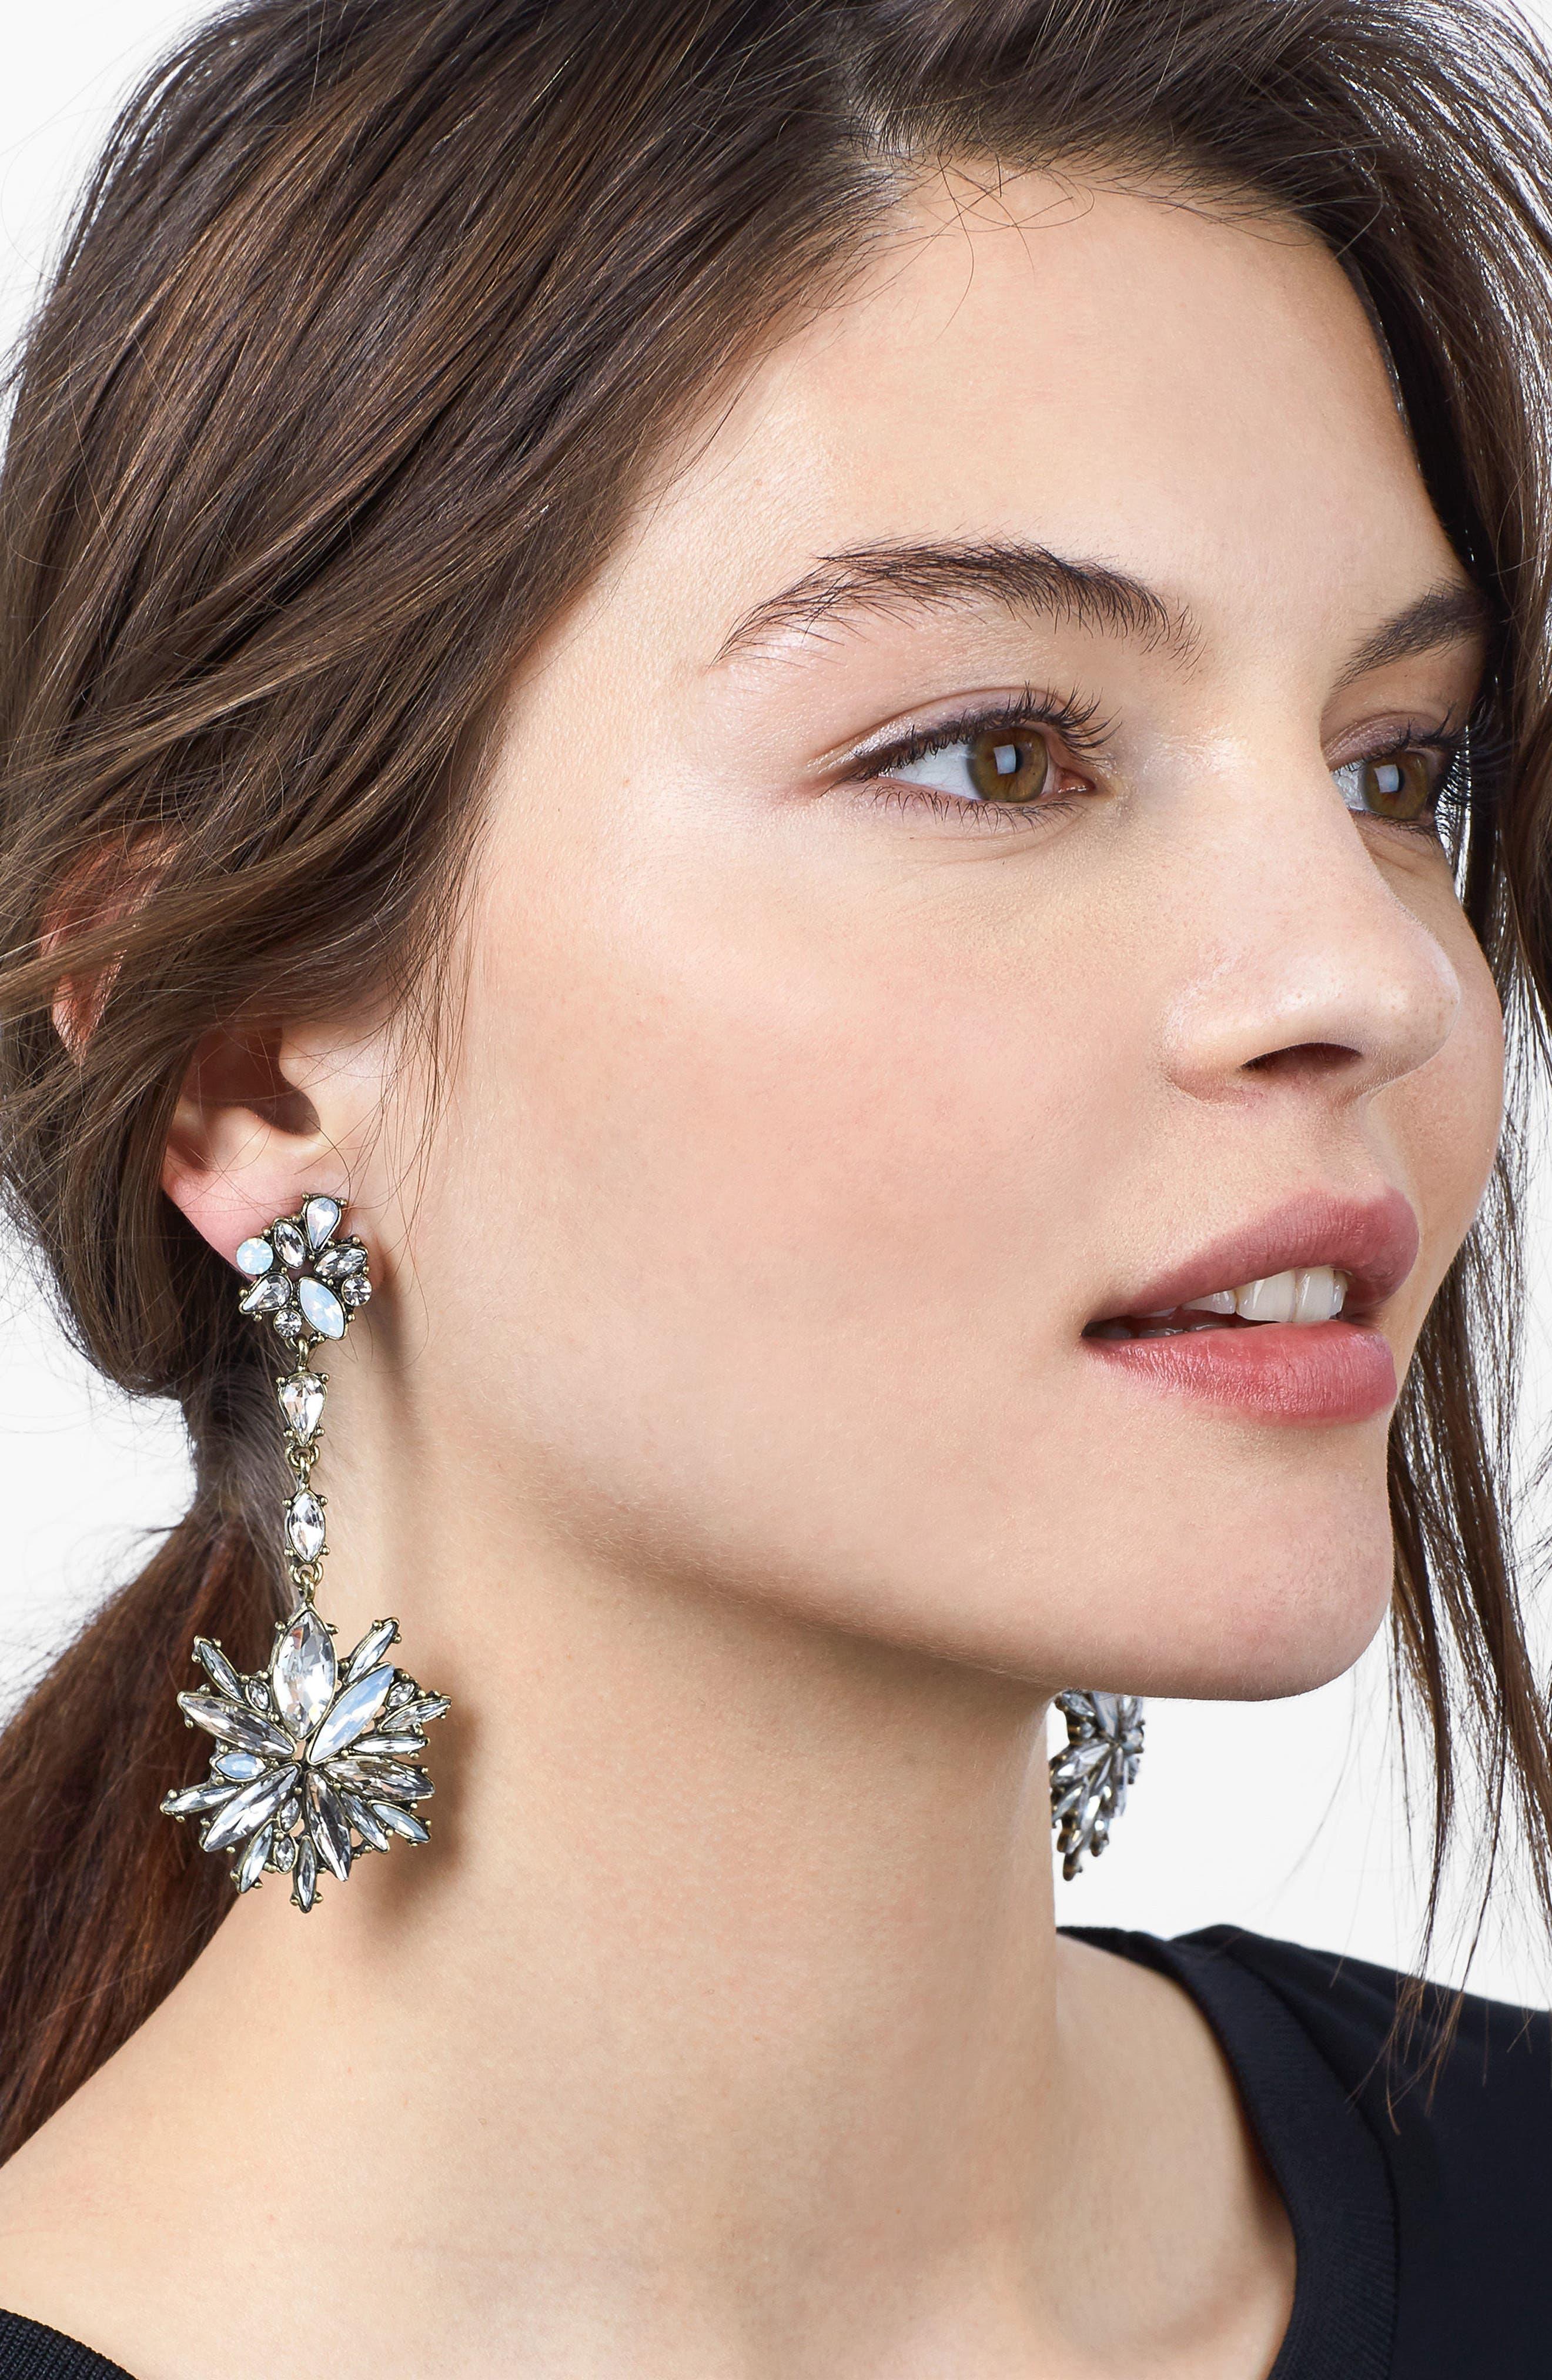 Icicle Drop Earrings,                             Alternate thumbnail 2, color,